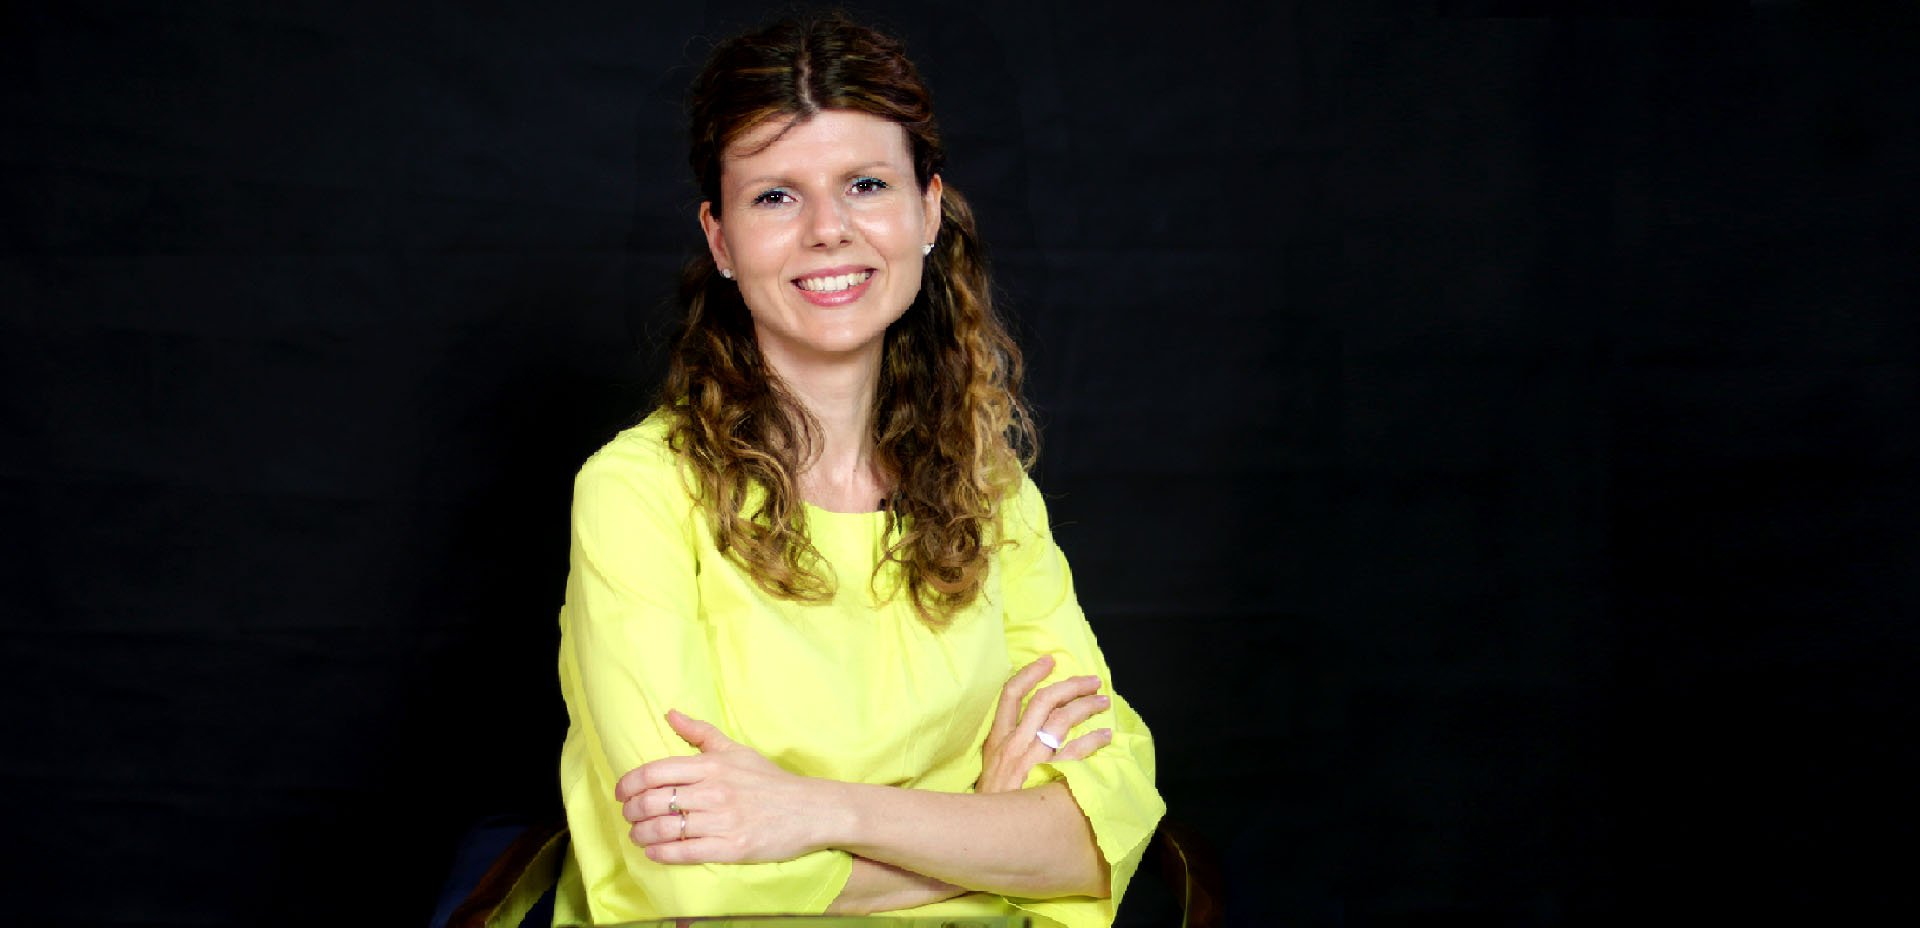 Dott.ssa Diana Zarantonello